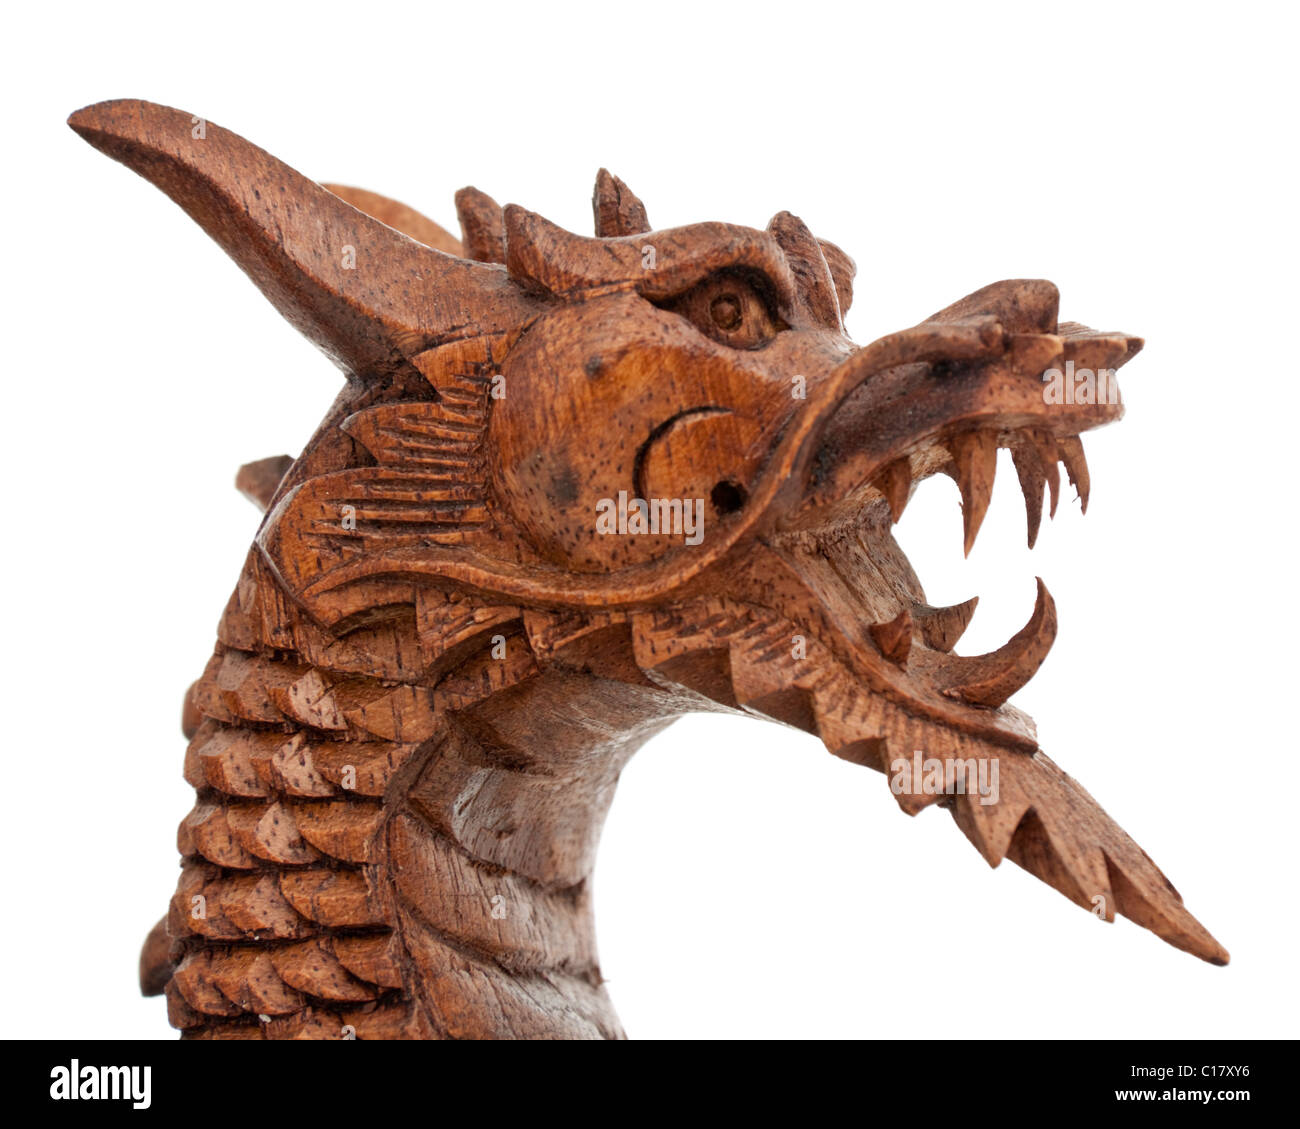 Close-up de feroz dragón de madera ornamento Imagen De Stock